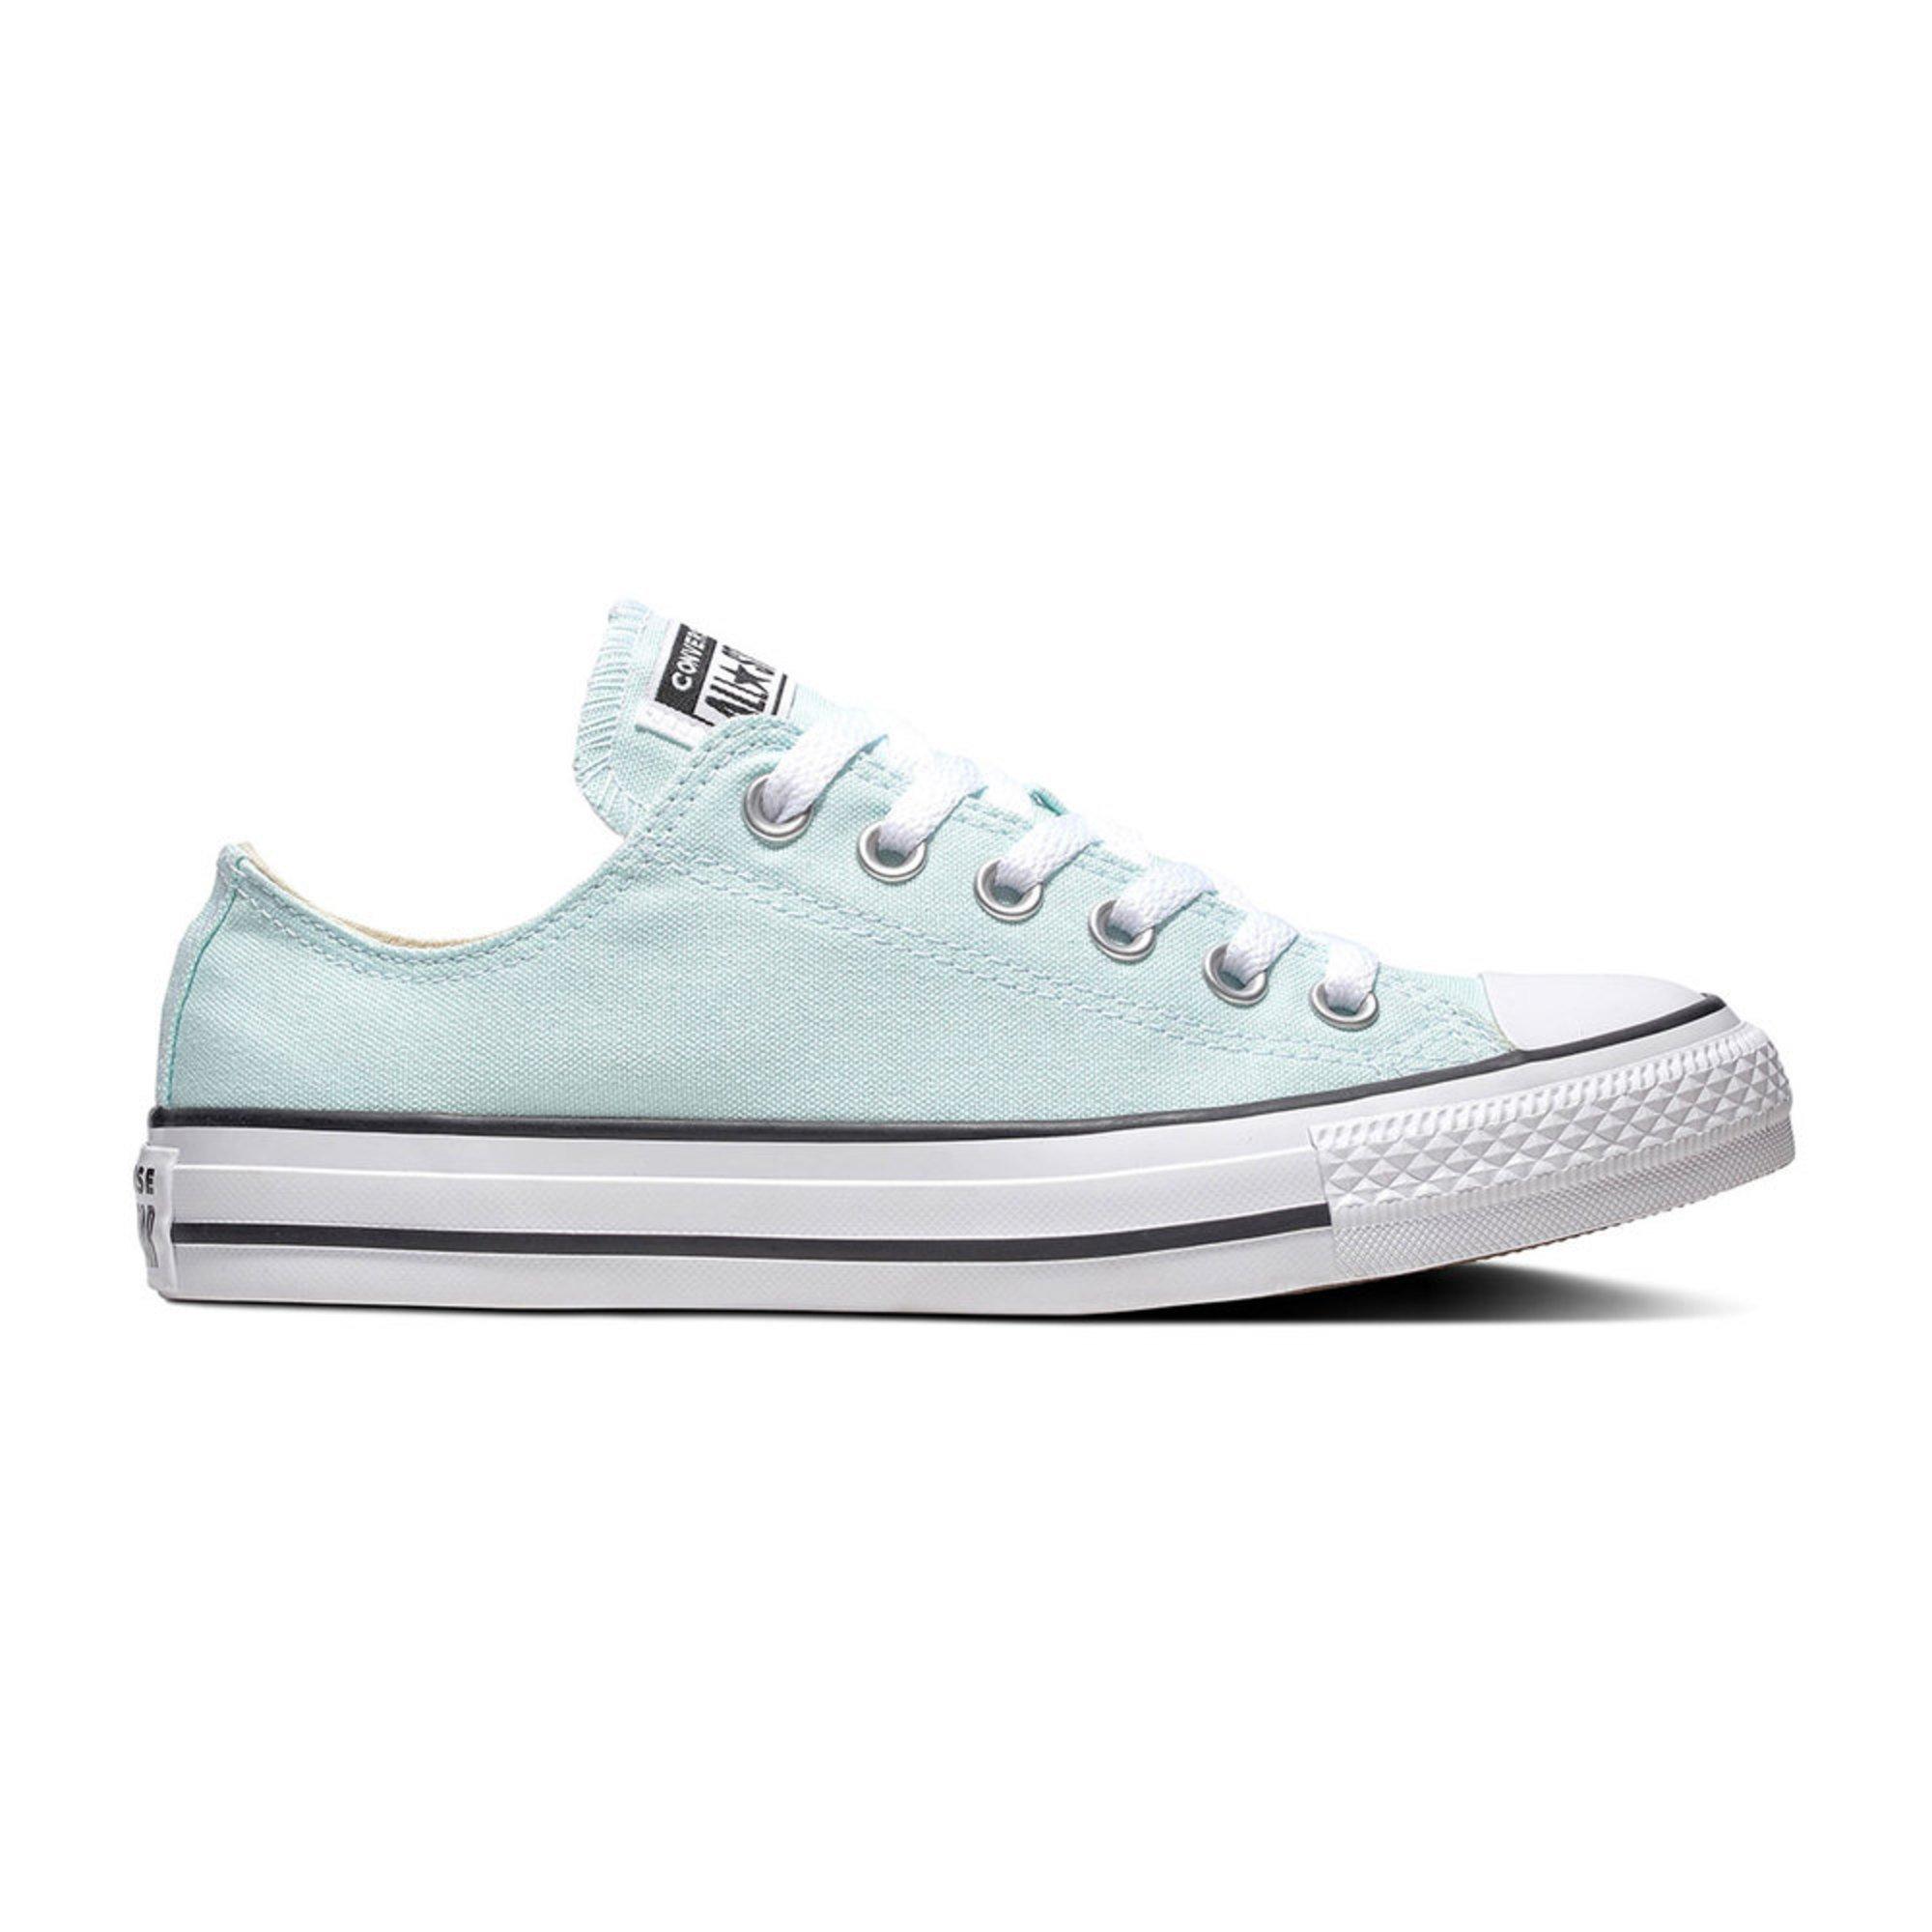 0503124b9b32 Converse. Converse Women s Chuck Taylor All Star Oxford Sneaker